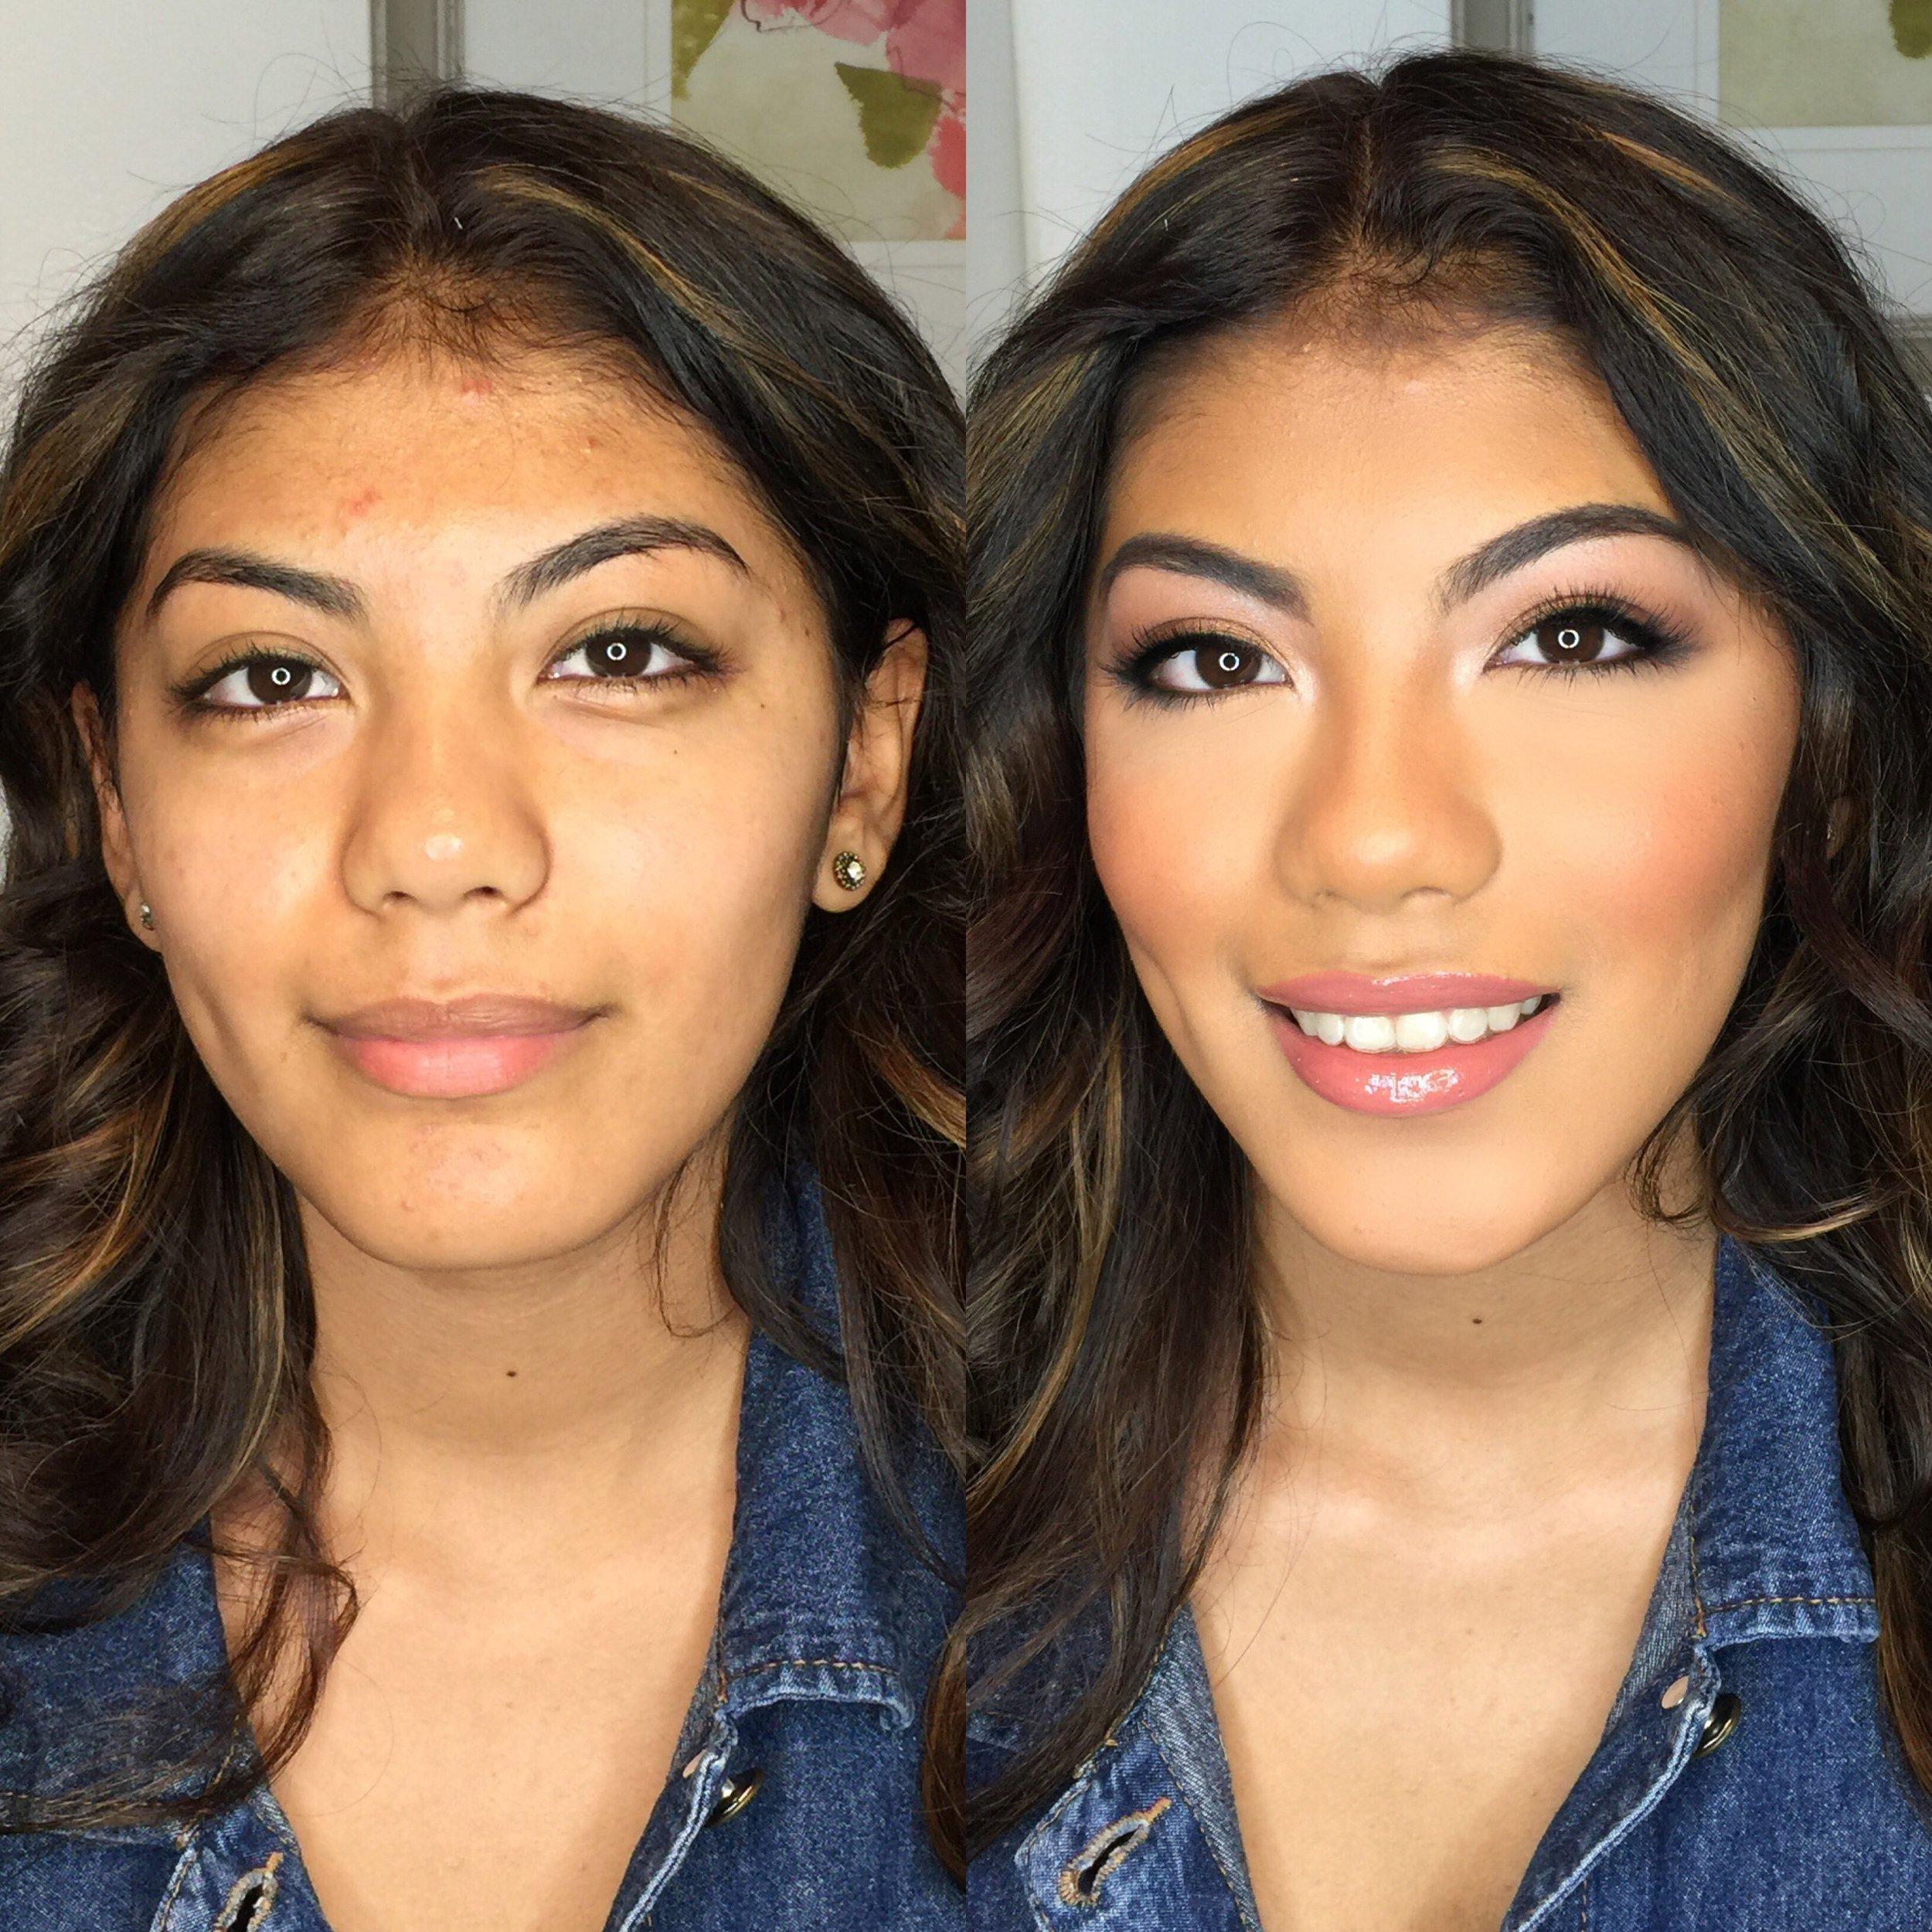 Patricia_Castro_Makeup_Los_Angeles_Makeup_Artist_64.JPG